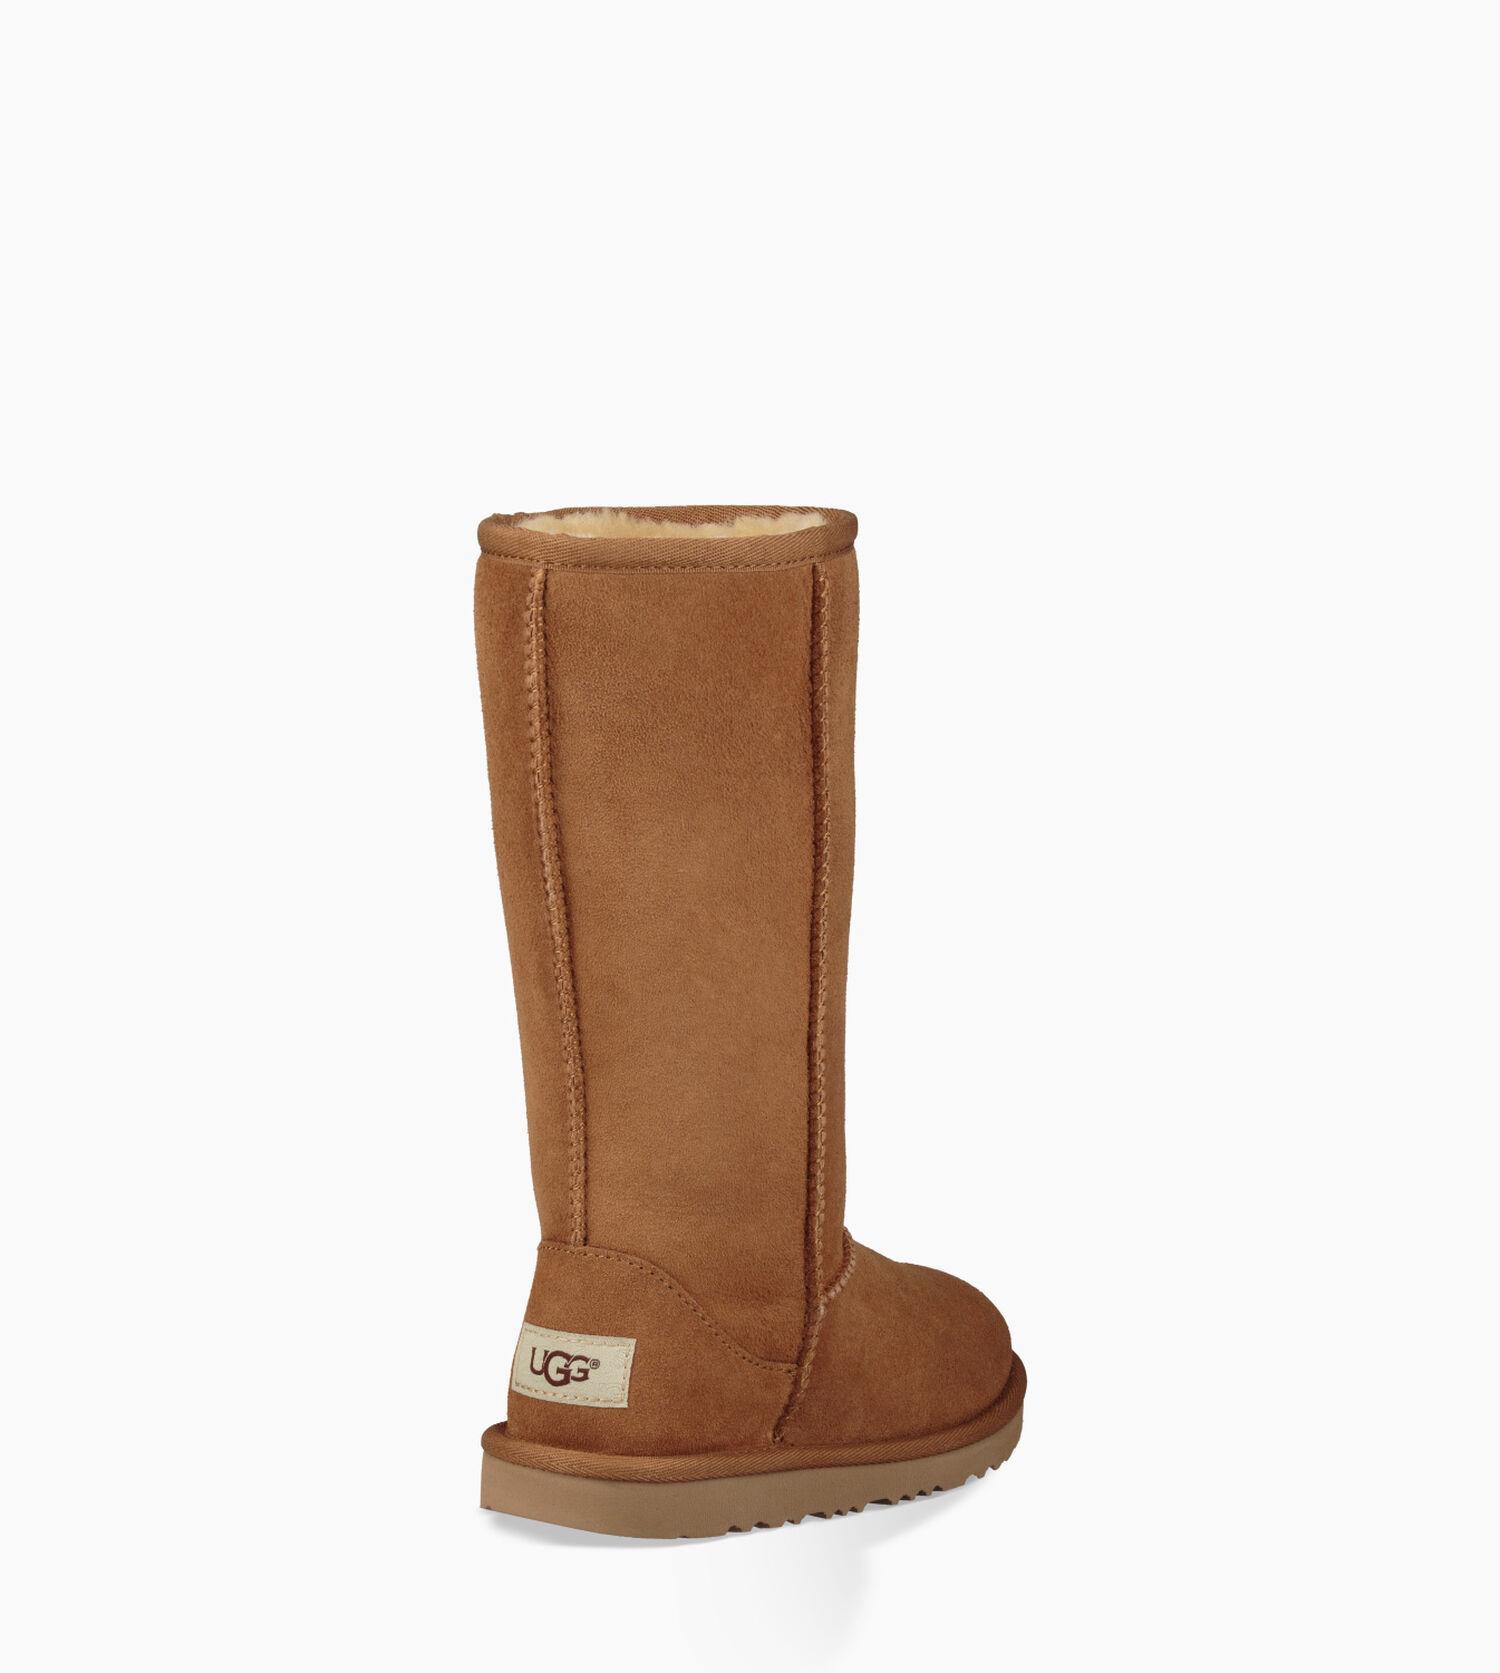 ugg boots 67